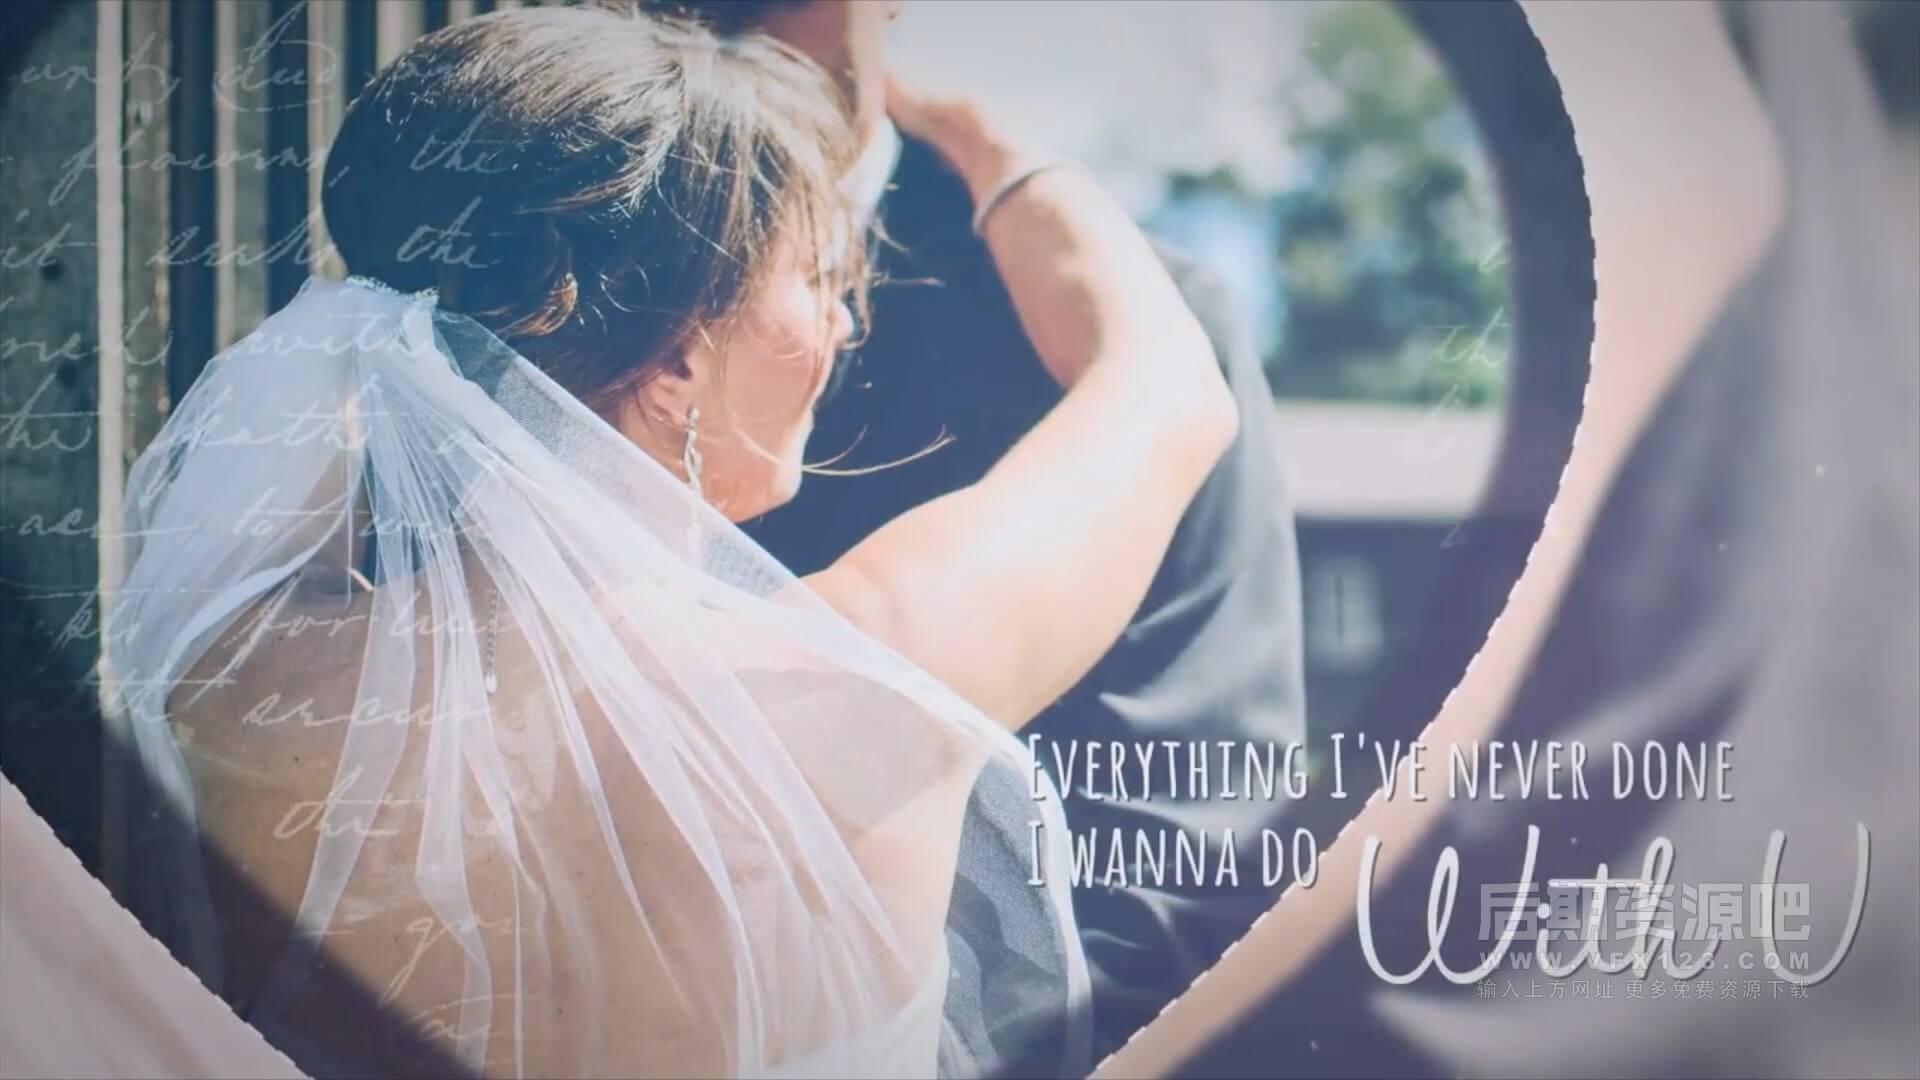 fcpx主题模板 浪漫爱情故事图片视频展示相册模板 Love Story Slideshow